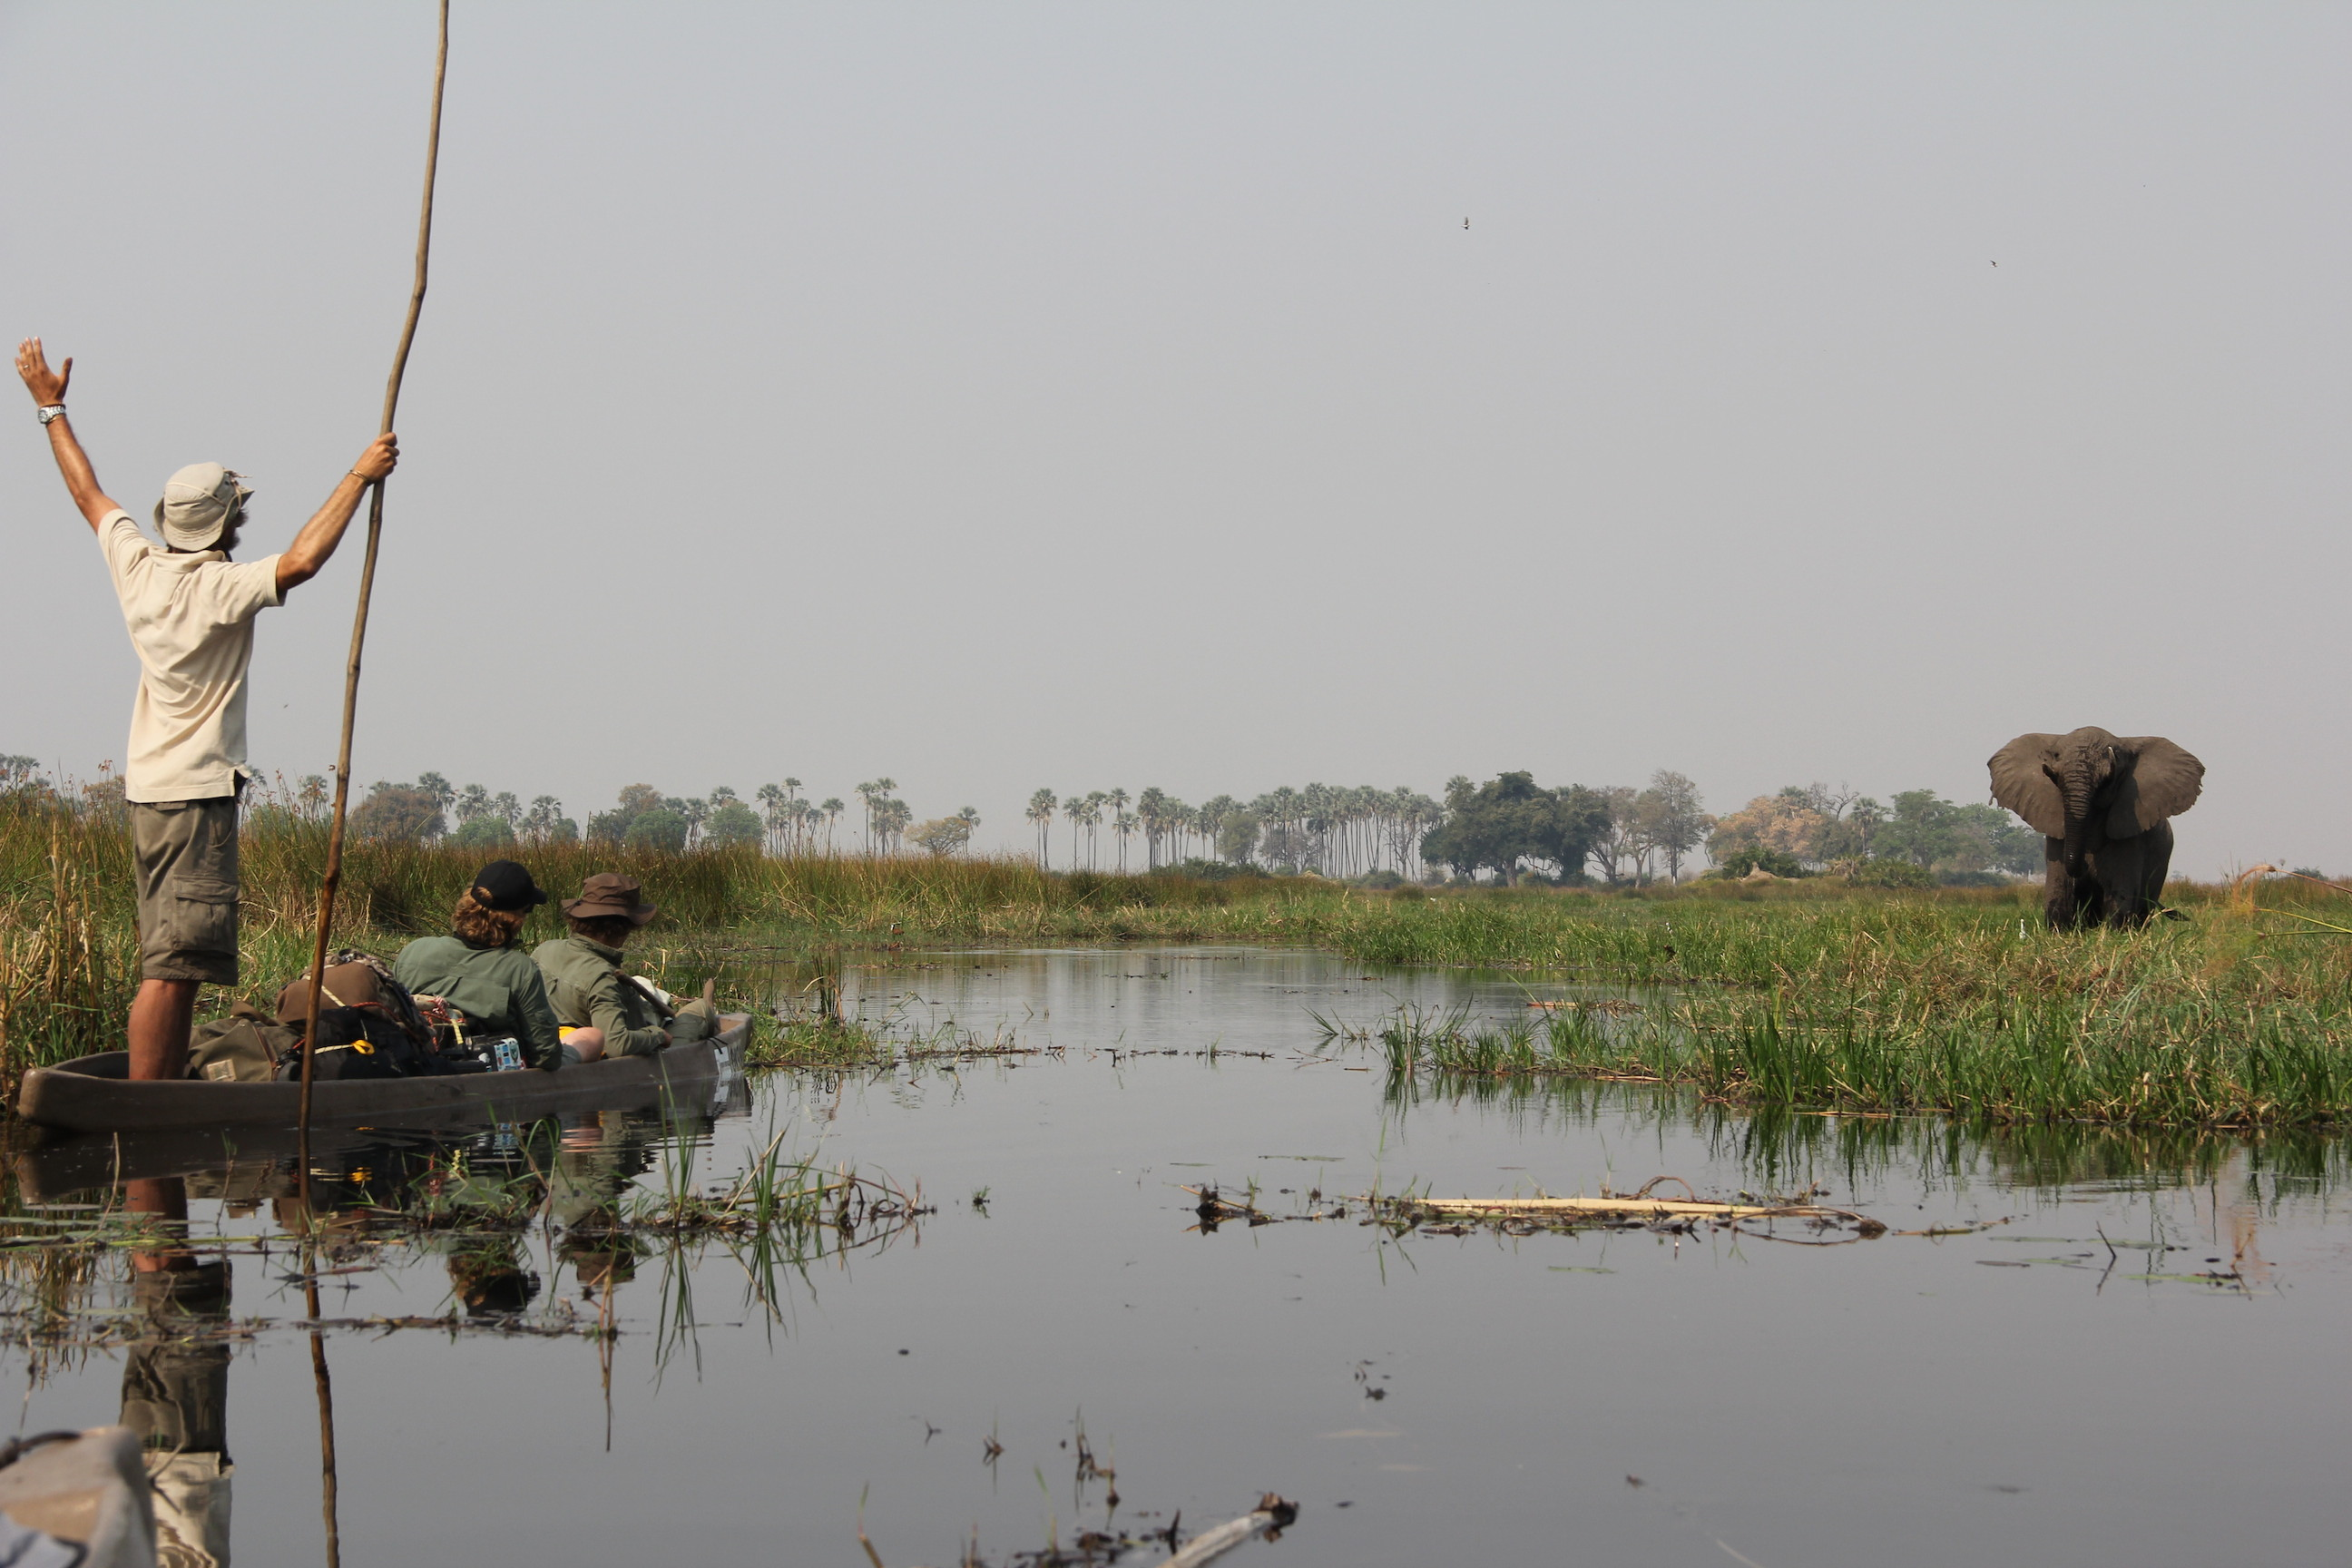 Boyes greeting an elephant while crossing the Okavango Delta. Image courtesy Steve Boyes.